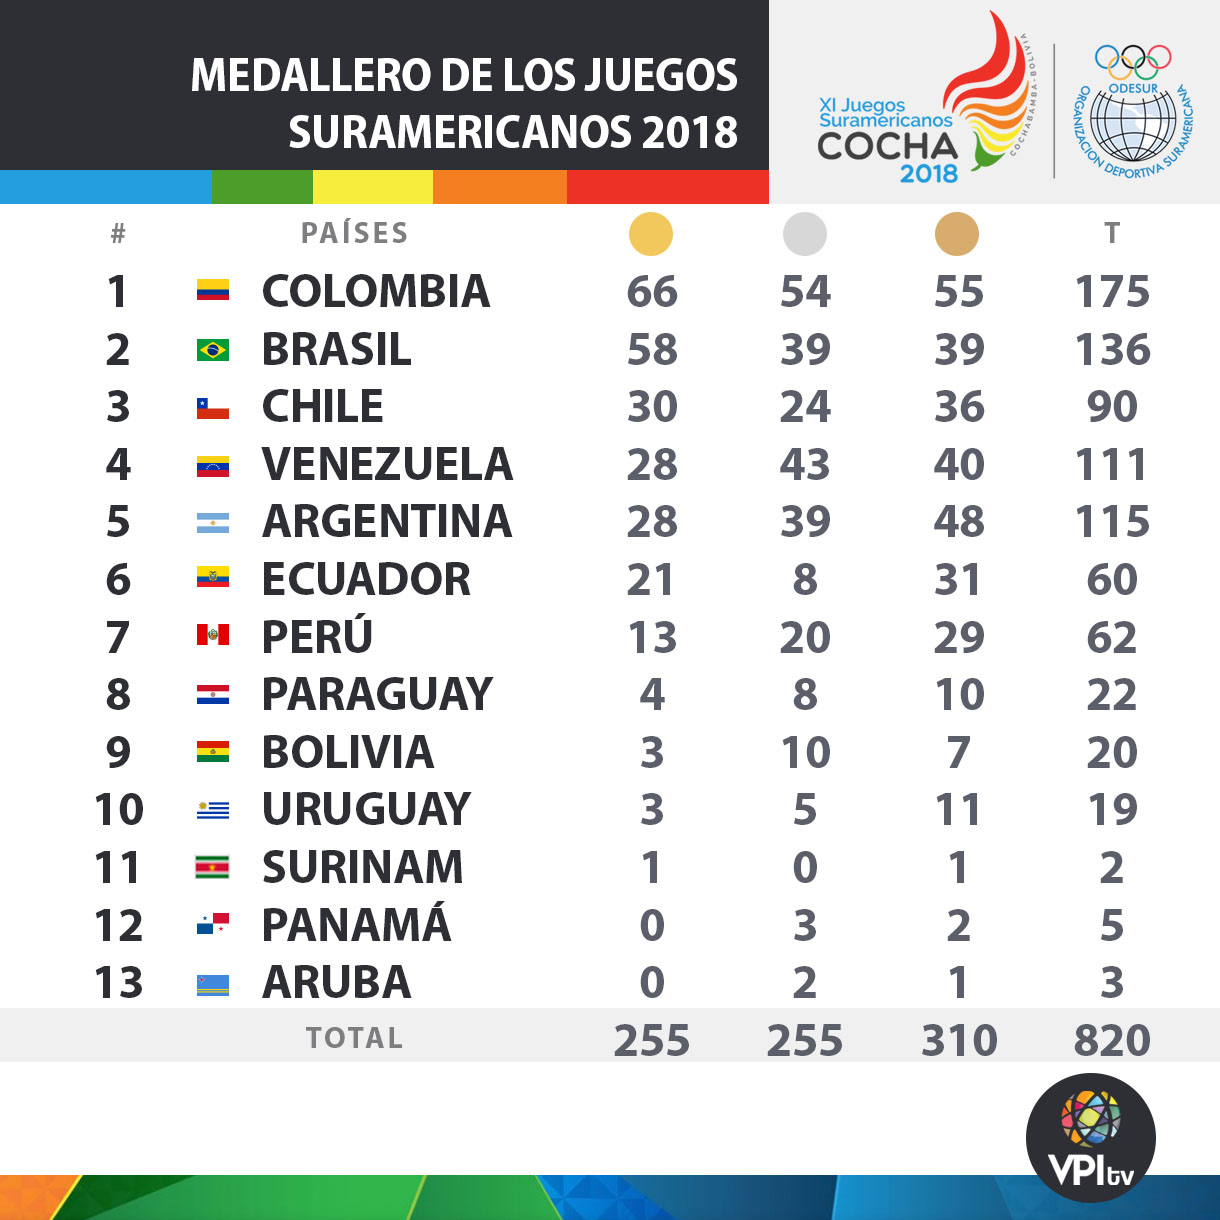 medallero-cochabamba-2018